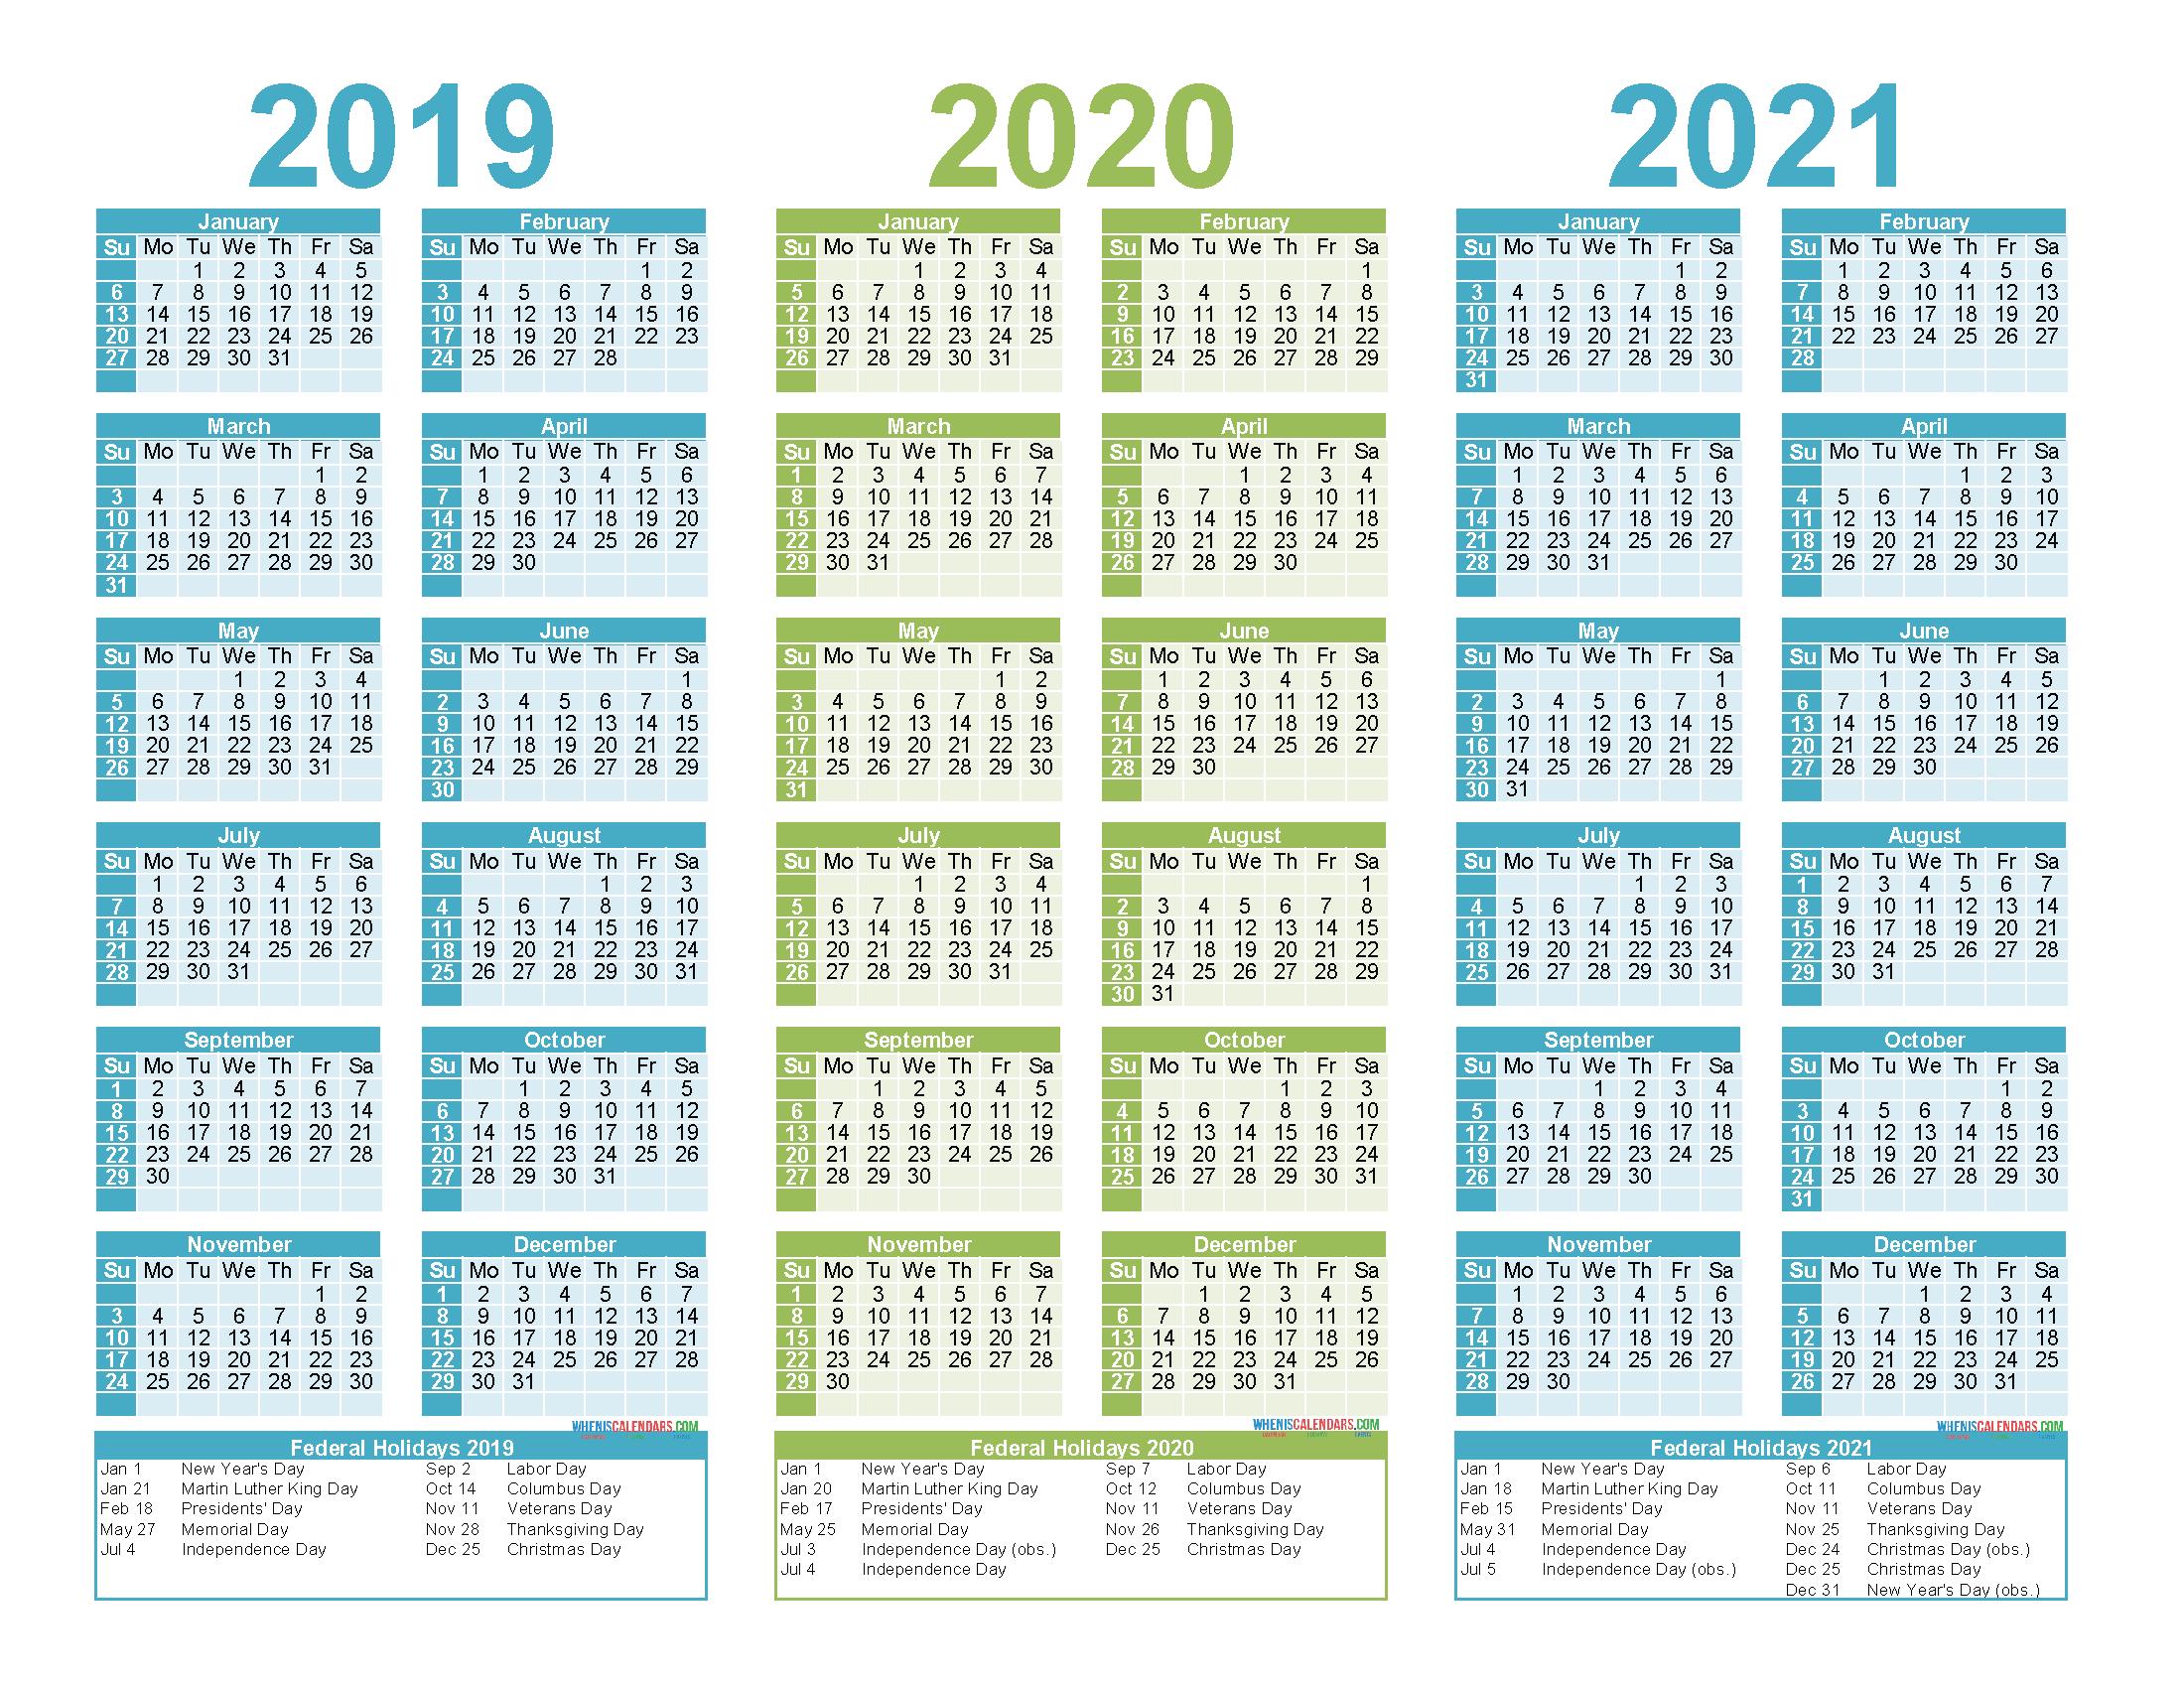 2019 To 2021 3 Year Calendar Printable Free Pdf, Word, Image